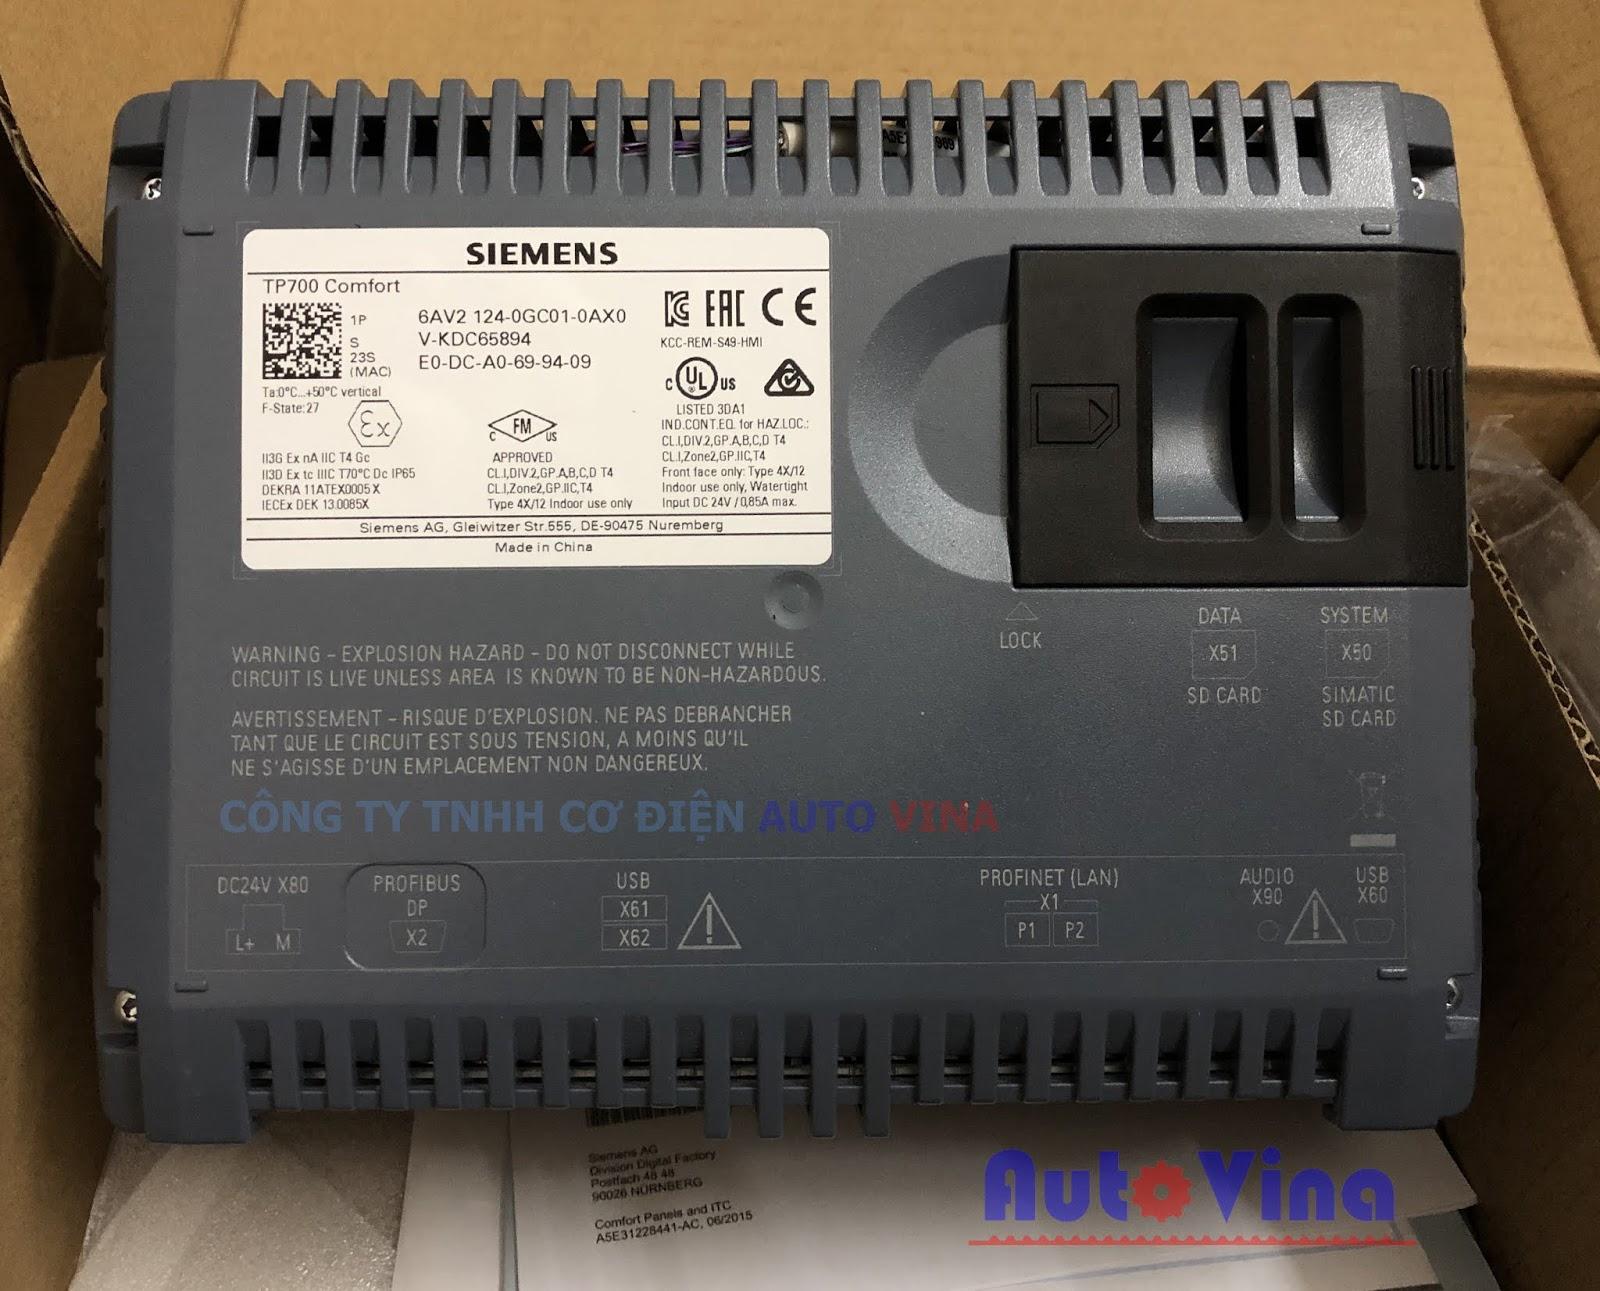 SIMATIC HMI TP700 Comfort 6AV2124-0GC01-0AX0